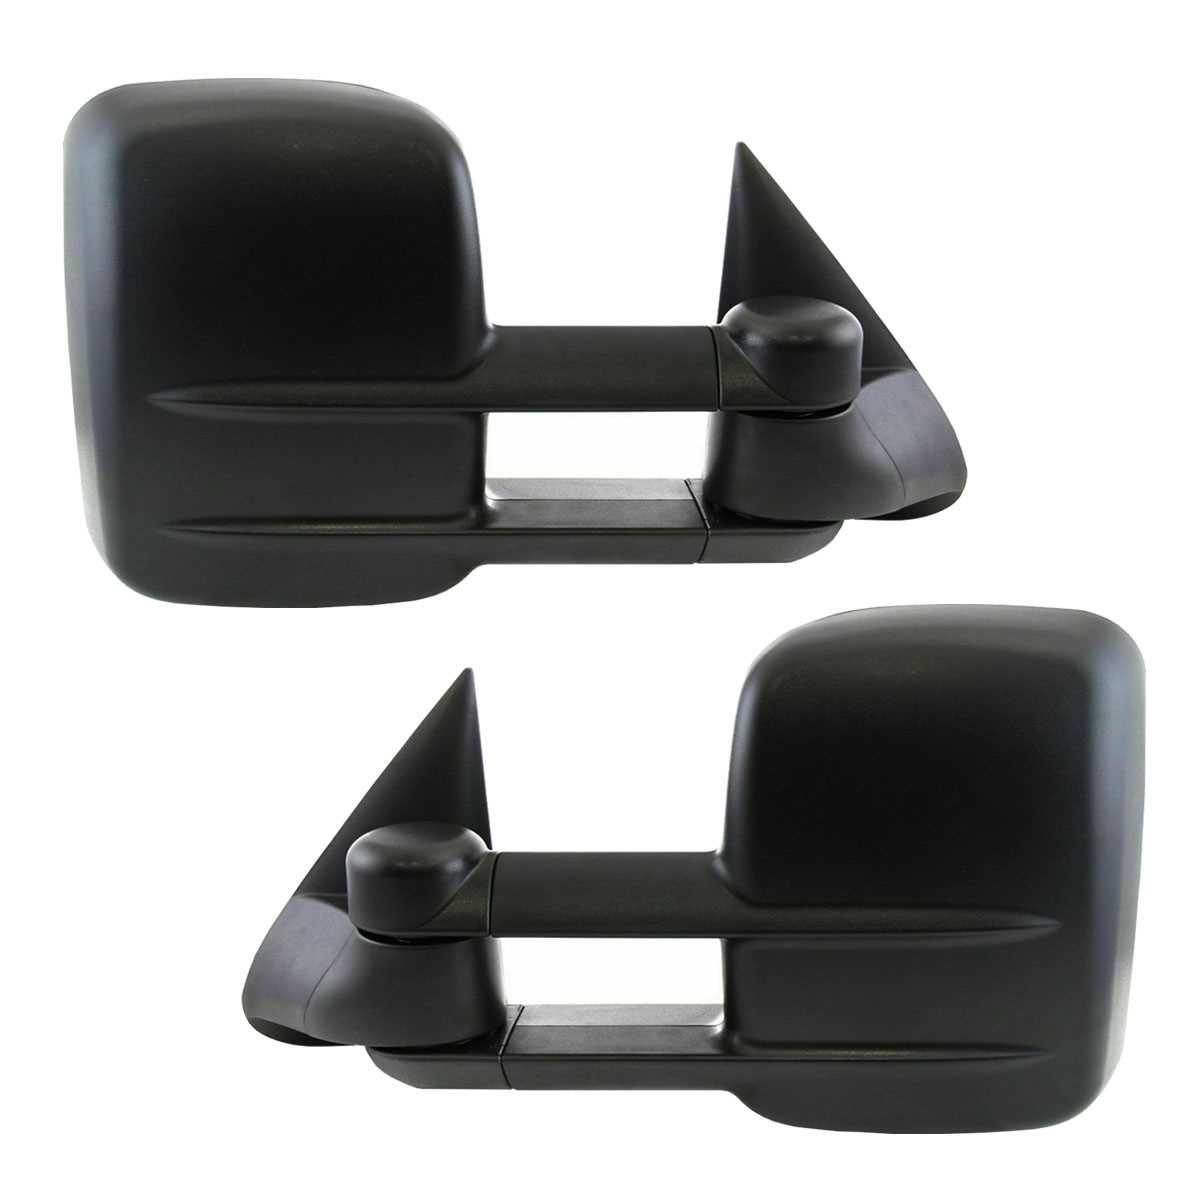 Pair-2-Power-Heated-Signal-Side-Mirror-Fits-2003-2006-Chevrolet-Silverado-1500 thumbnail 2